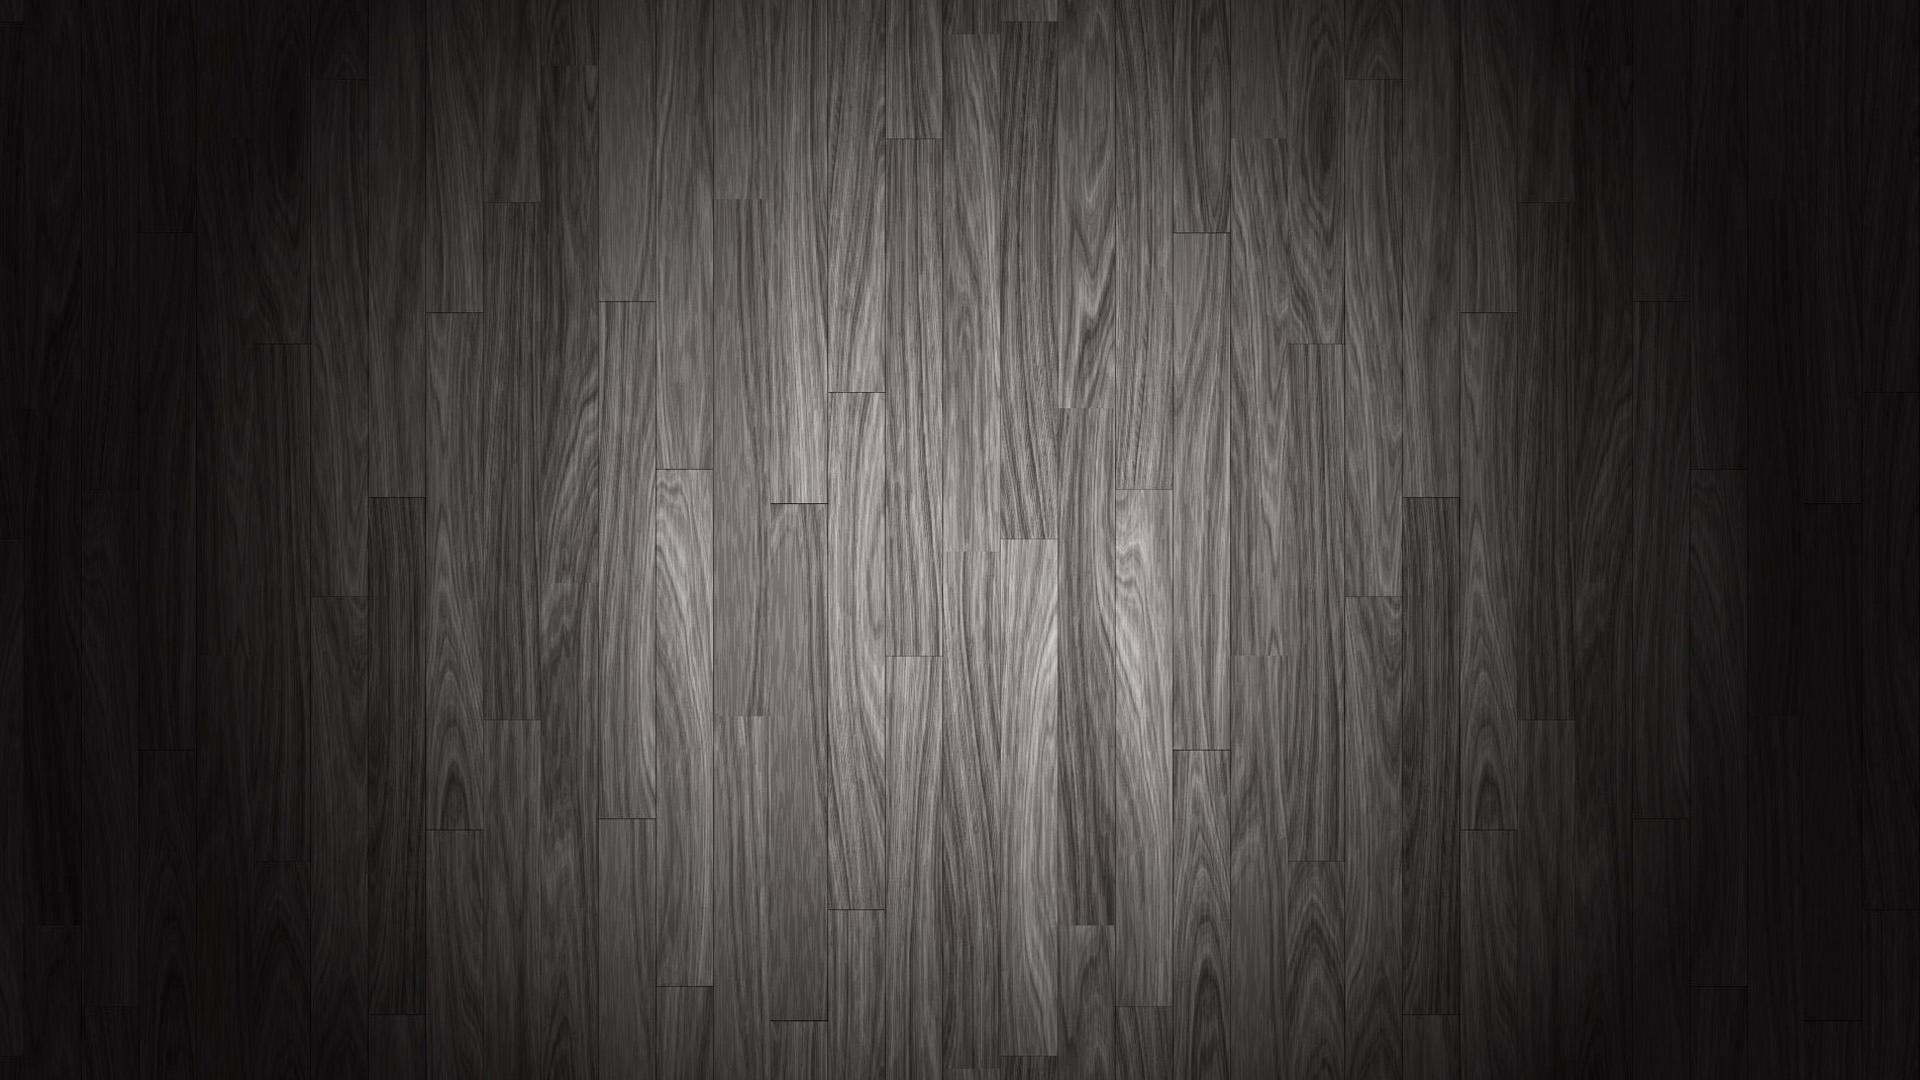 Hd Wallpapers Barn Wood Texture 1300 X 954 543 Kb Jpeg HD Wallpapers 1920x1080